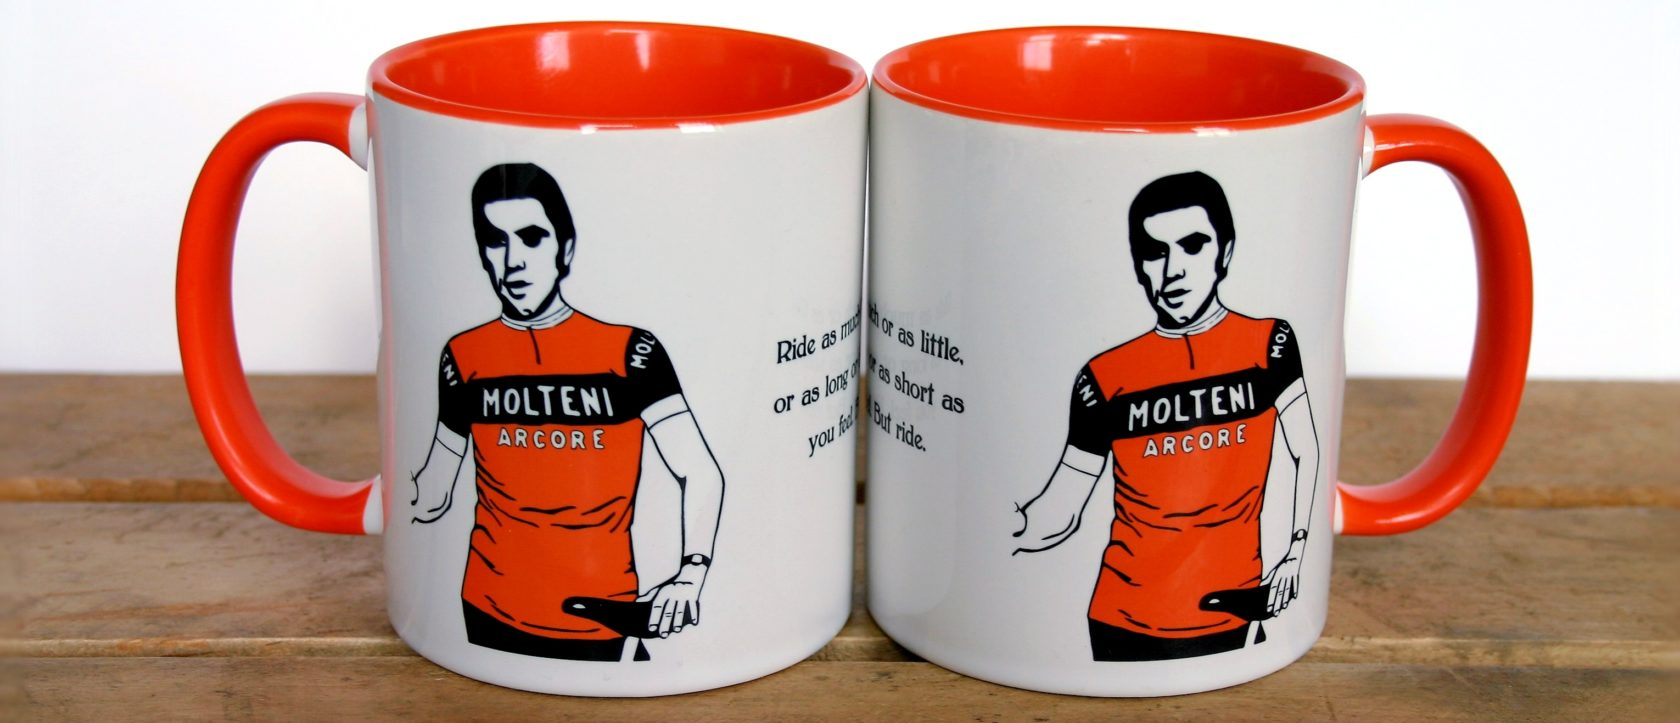 Eddy Merckx - Just Ride